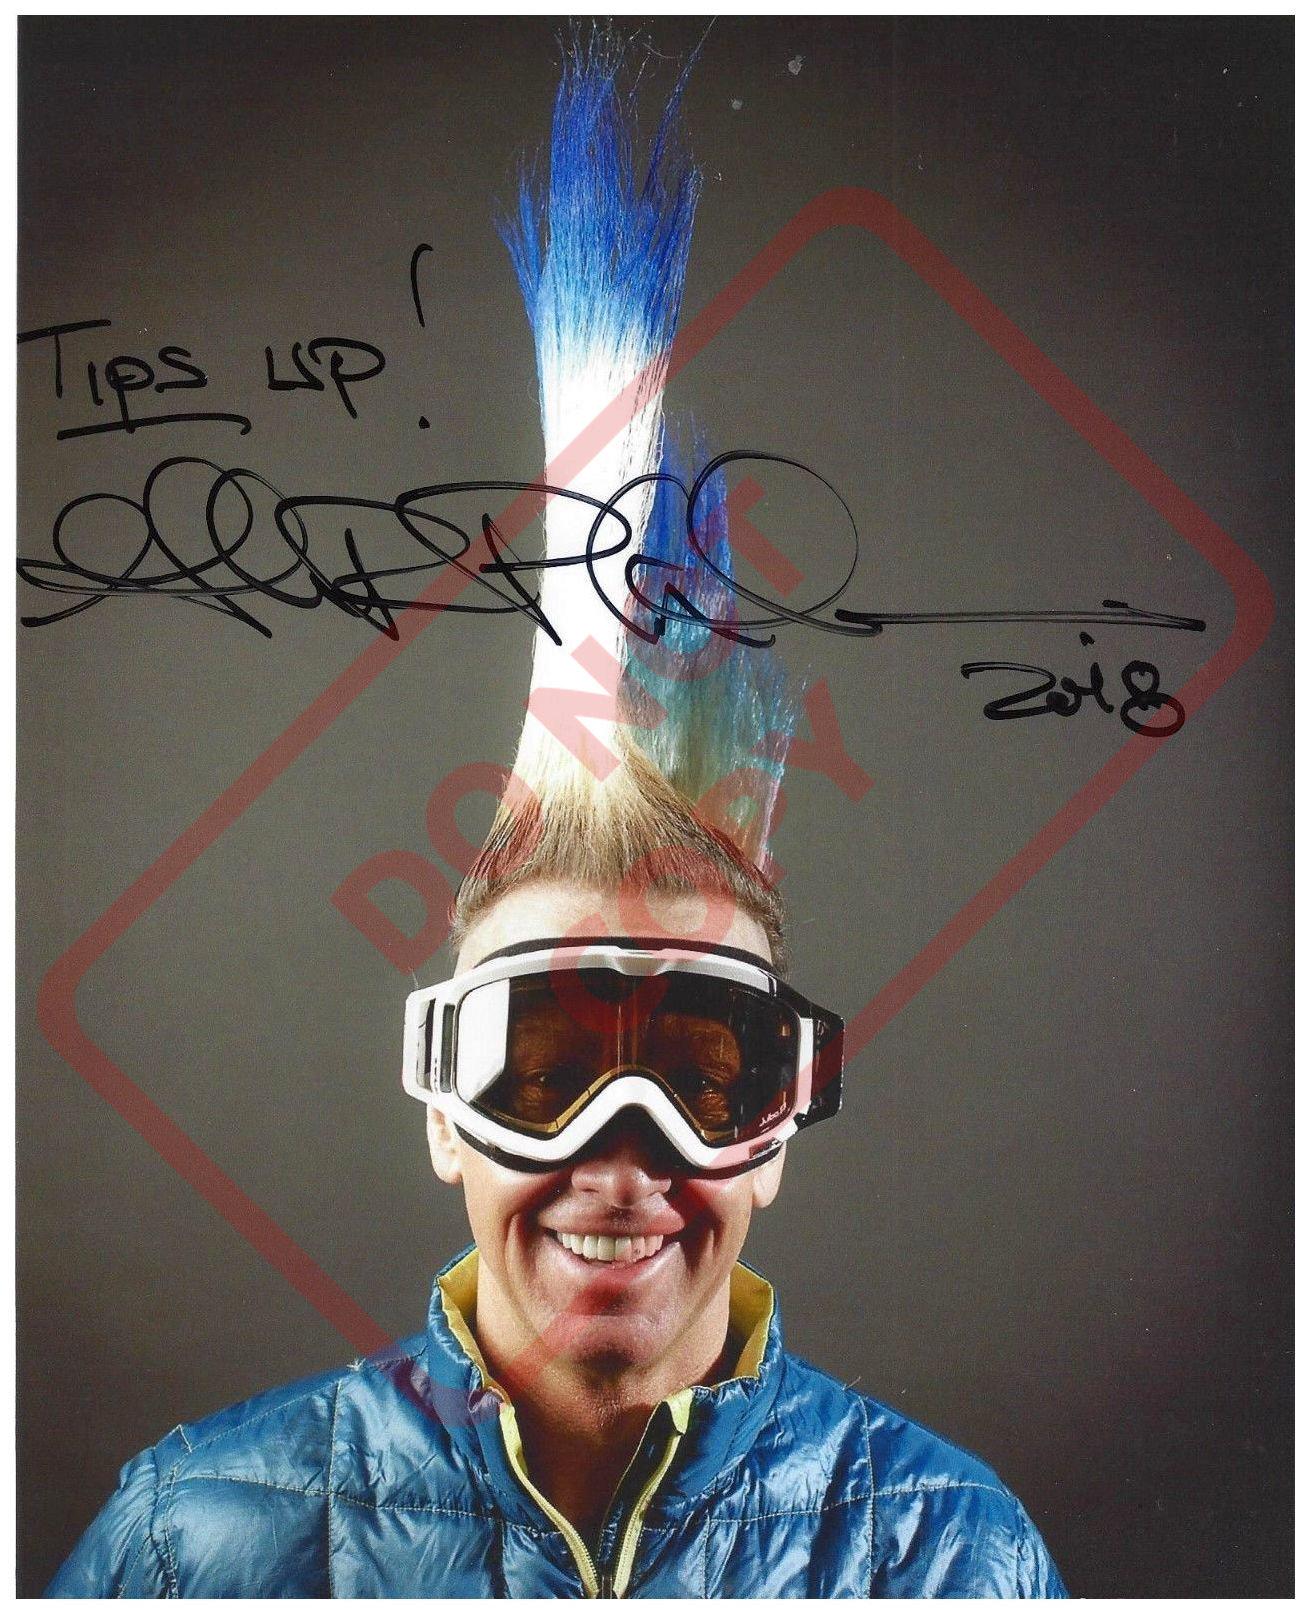 8.5x11 Autographed Signed Reprint RP Photo Sandra Bullock Cate Blanchett | eBay